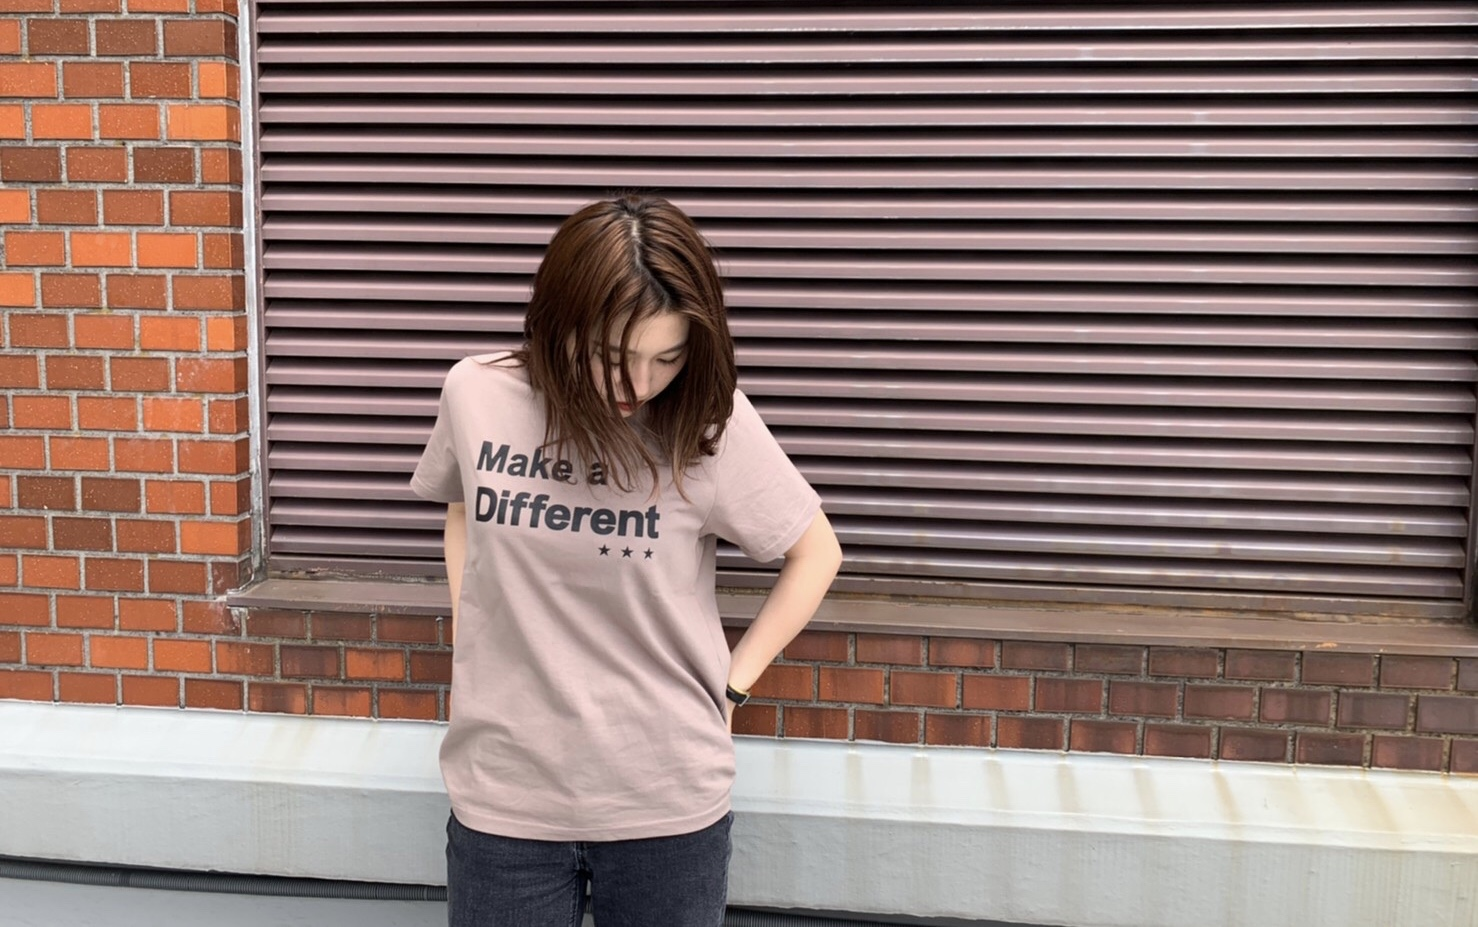 Scrap Book スクラップブック 韓国製 ロゴプリント コットン素材 三つ星 オリジナルTシャツ 半袖Tシャツ